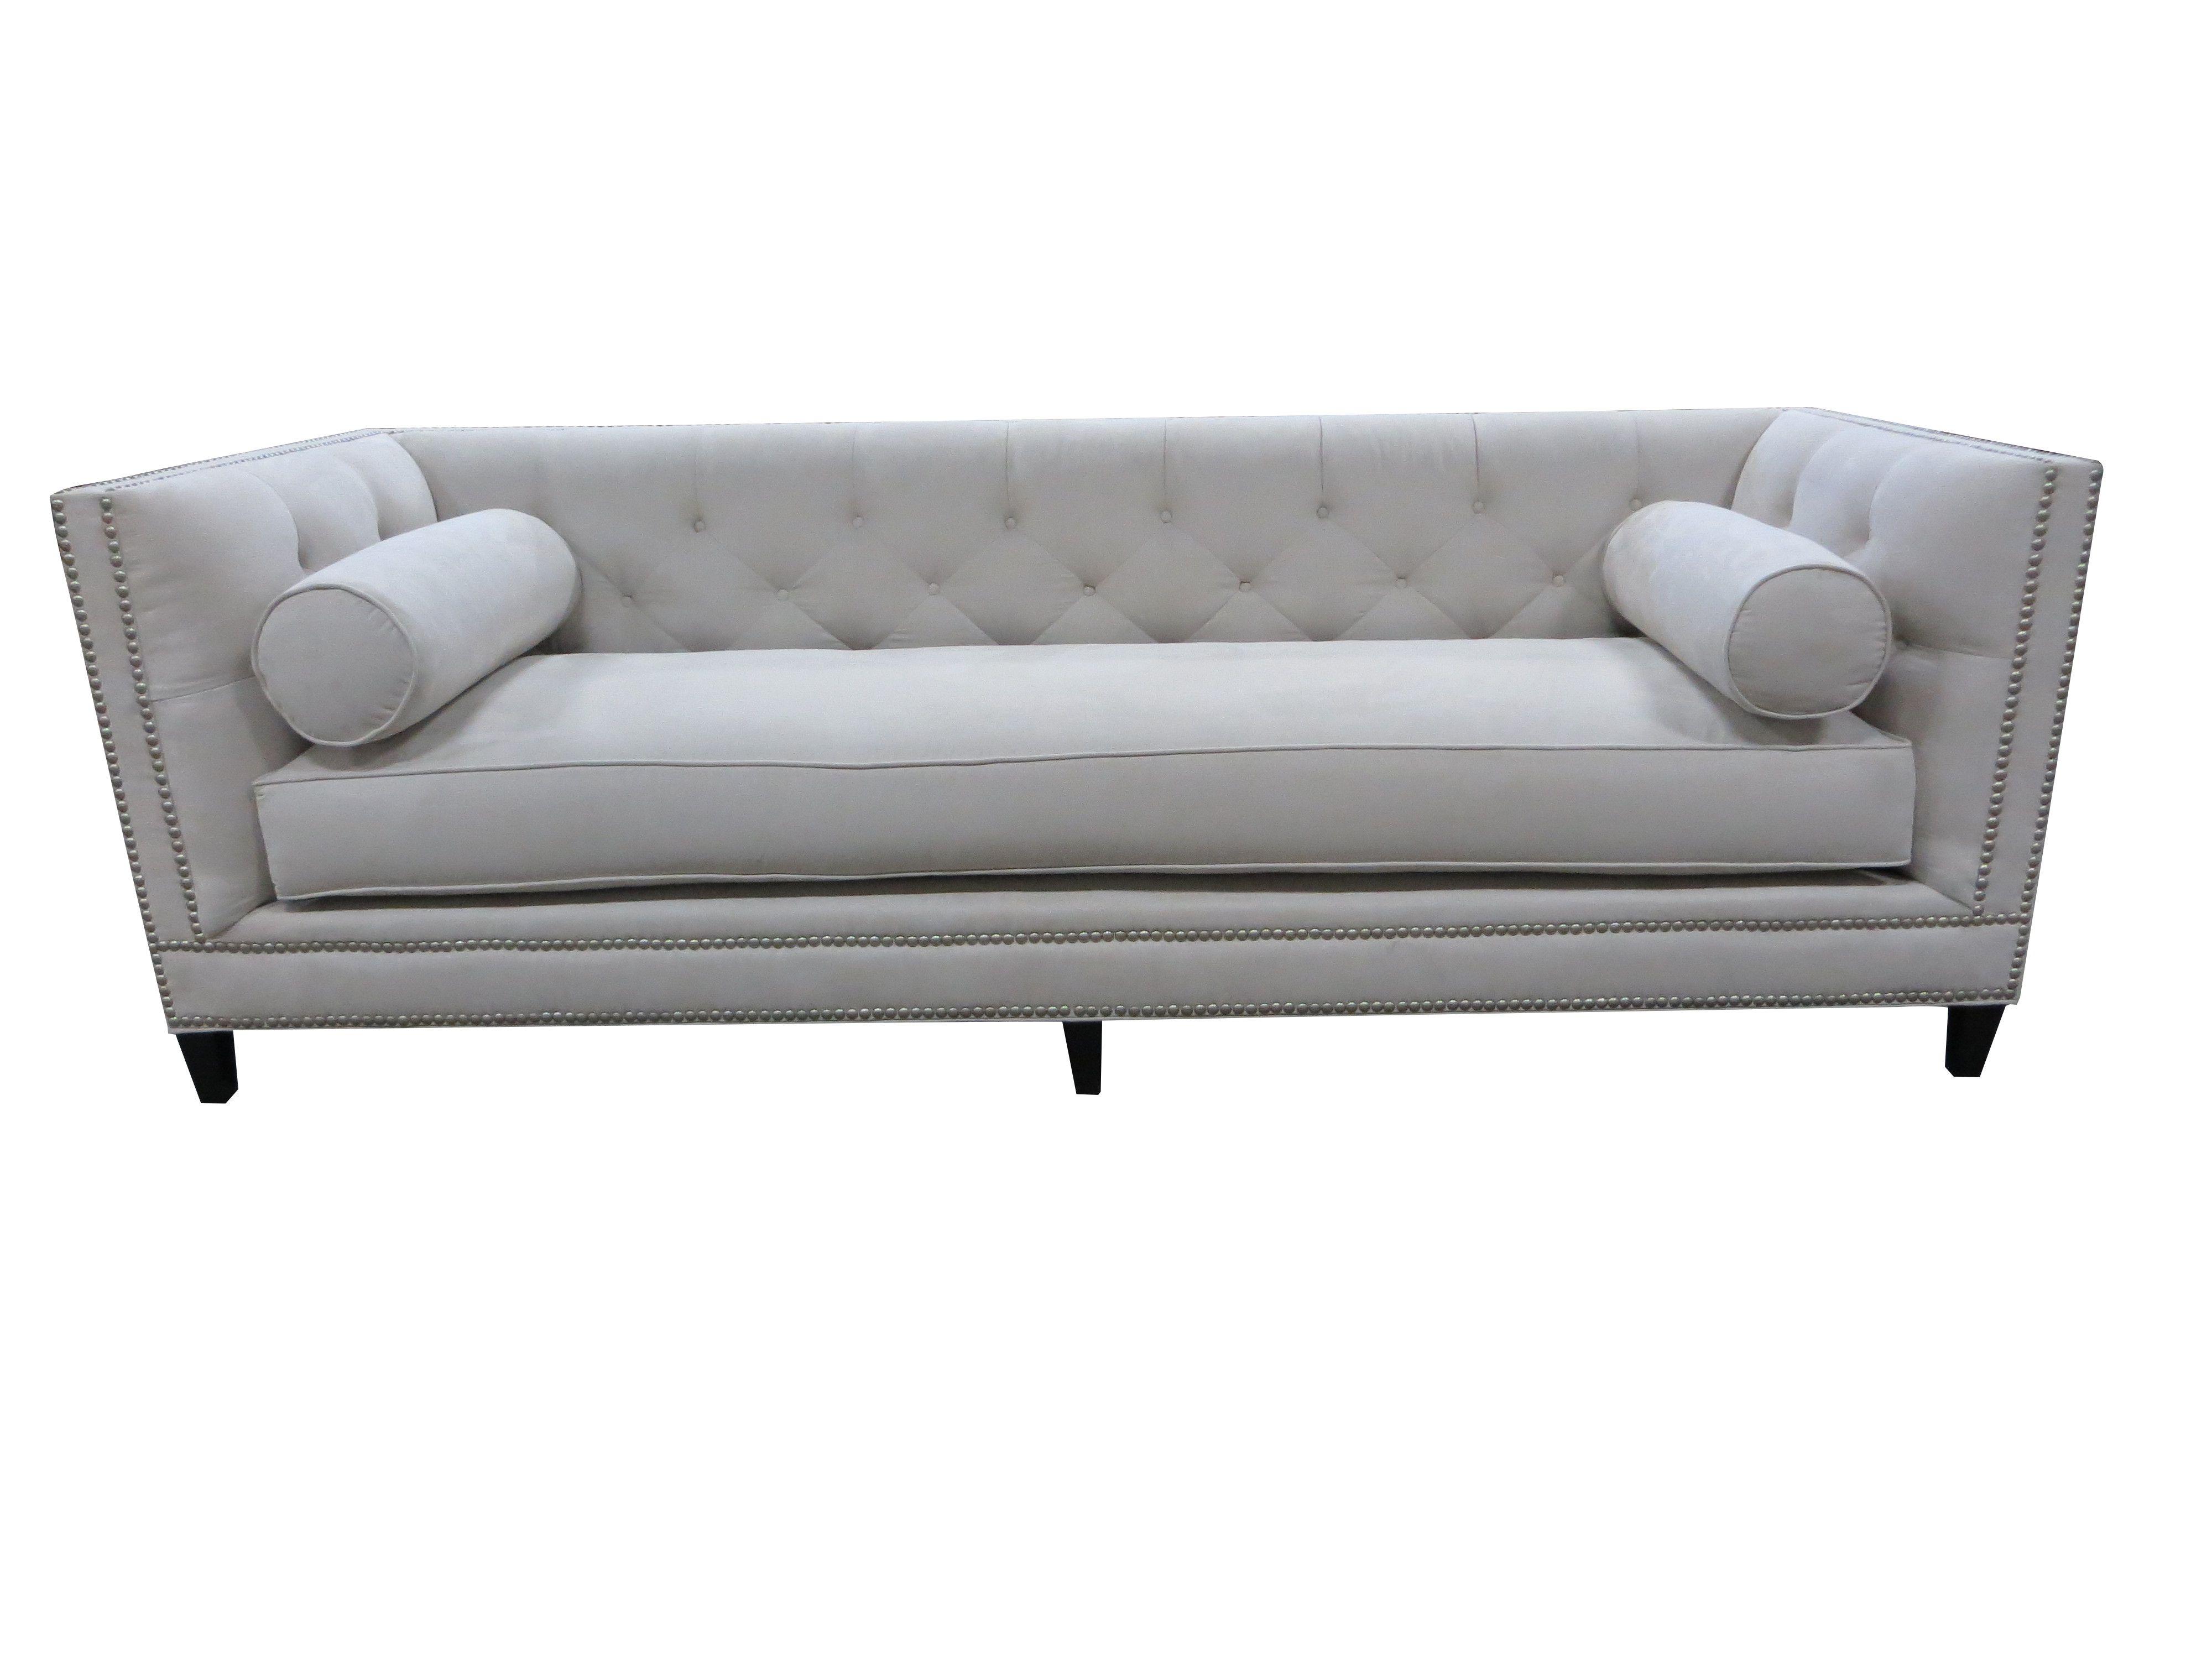 Tls By Design Elegant Tuxedo Style Sofa Comfort Sofas